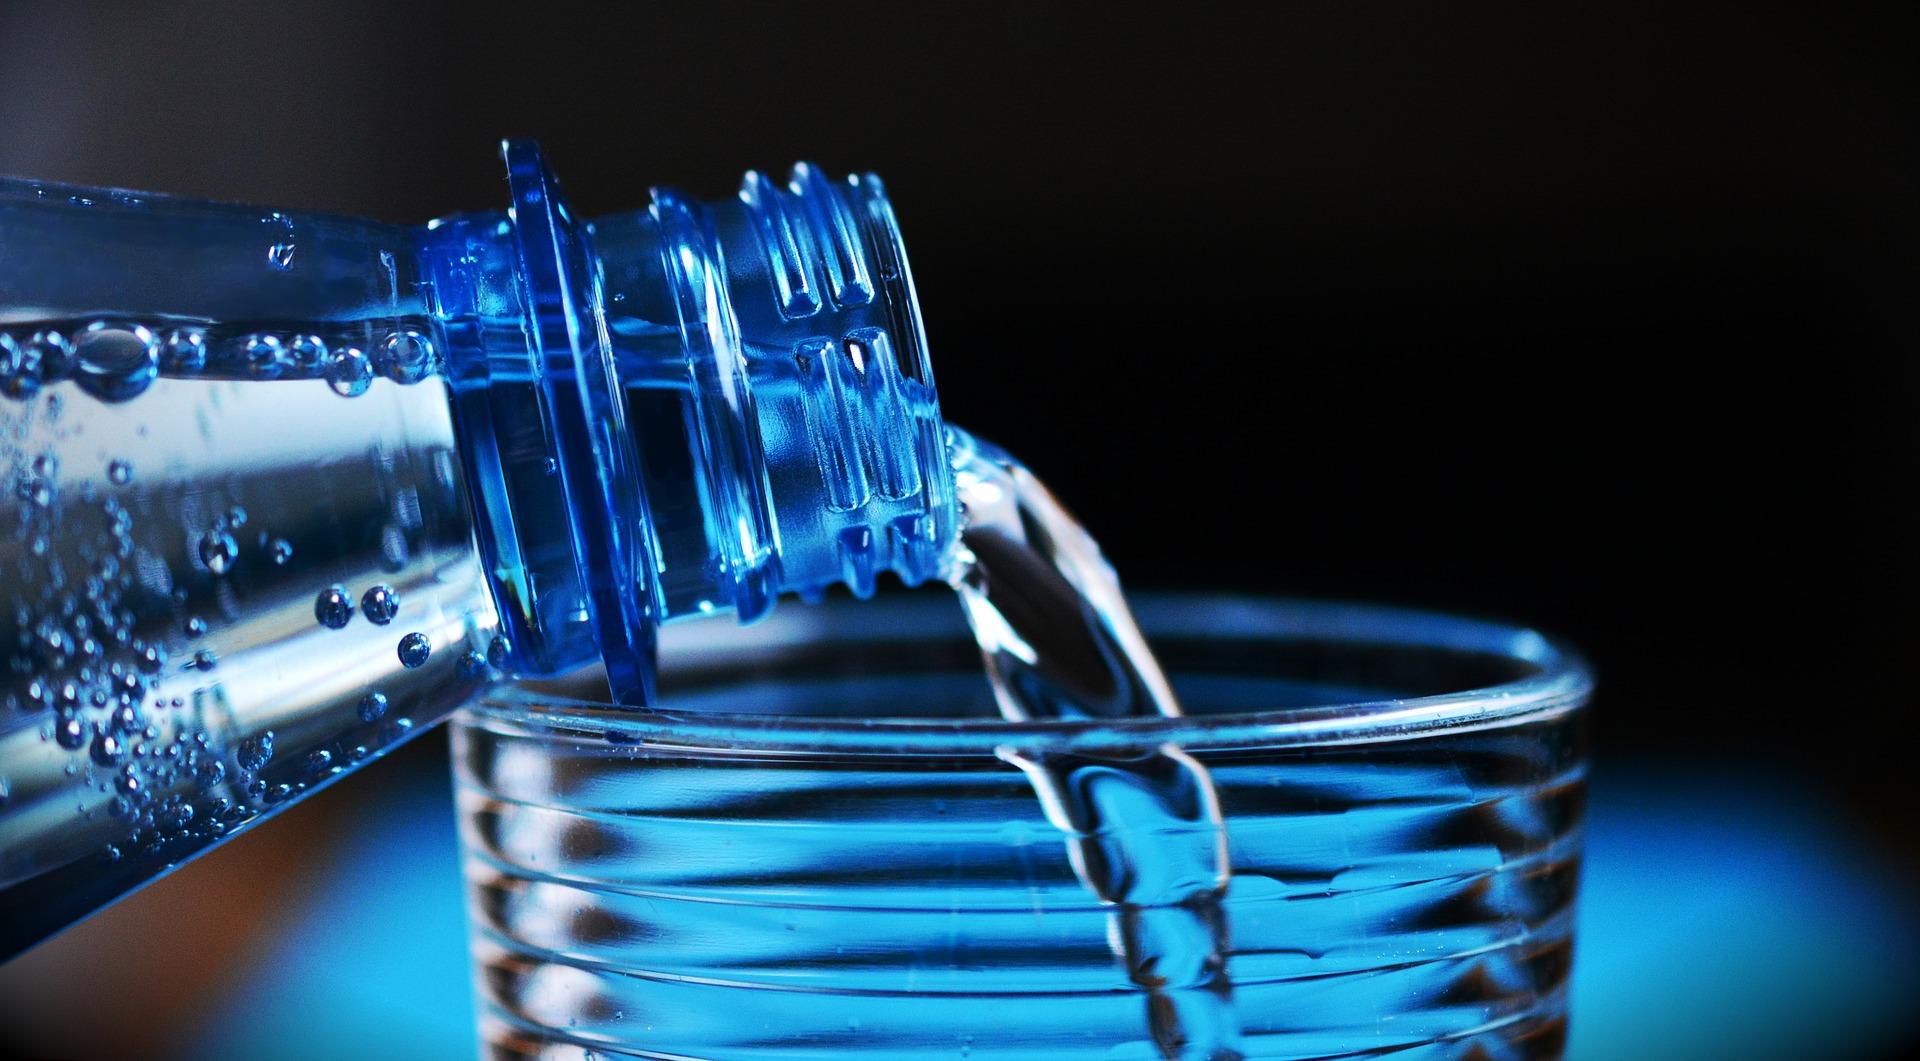 Konfederacja Lewiatan: Kaucje za butelki plastikowe tuż, tuż